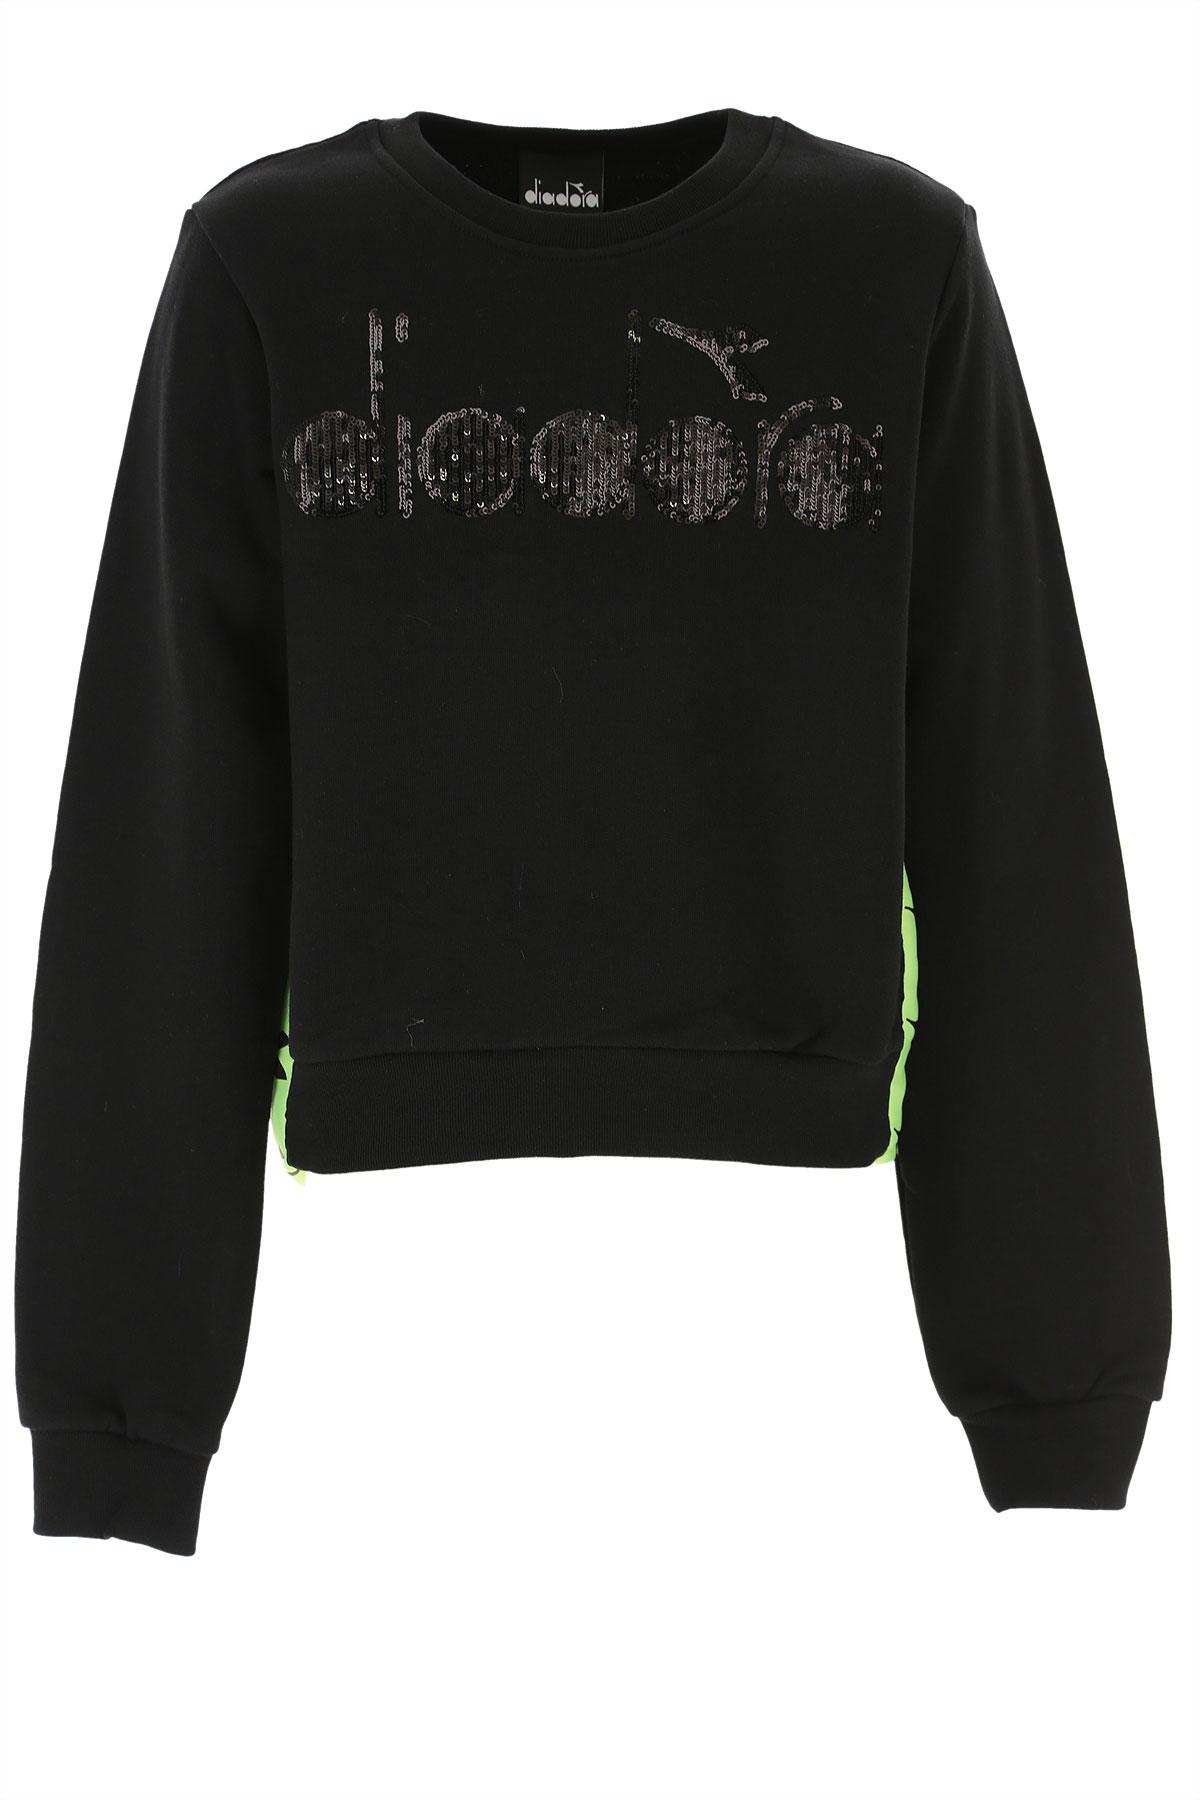 Diadora Kids Sweatshirts & Hoodies for Girls On Sale, Black, Cotton, 2019, 10Y 12Y 14Y 8Y